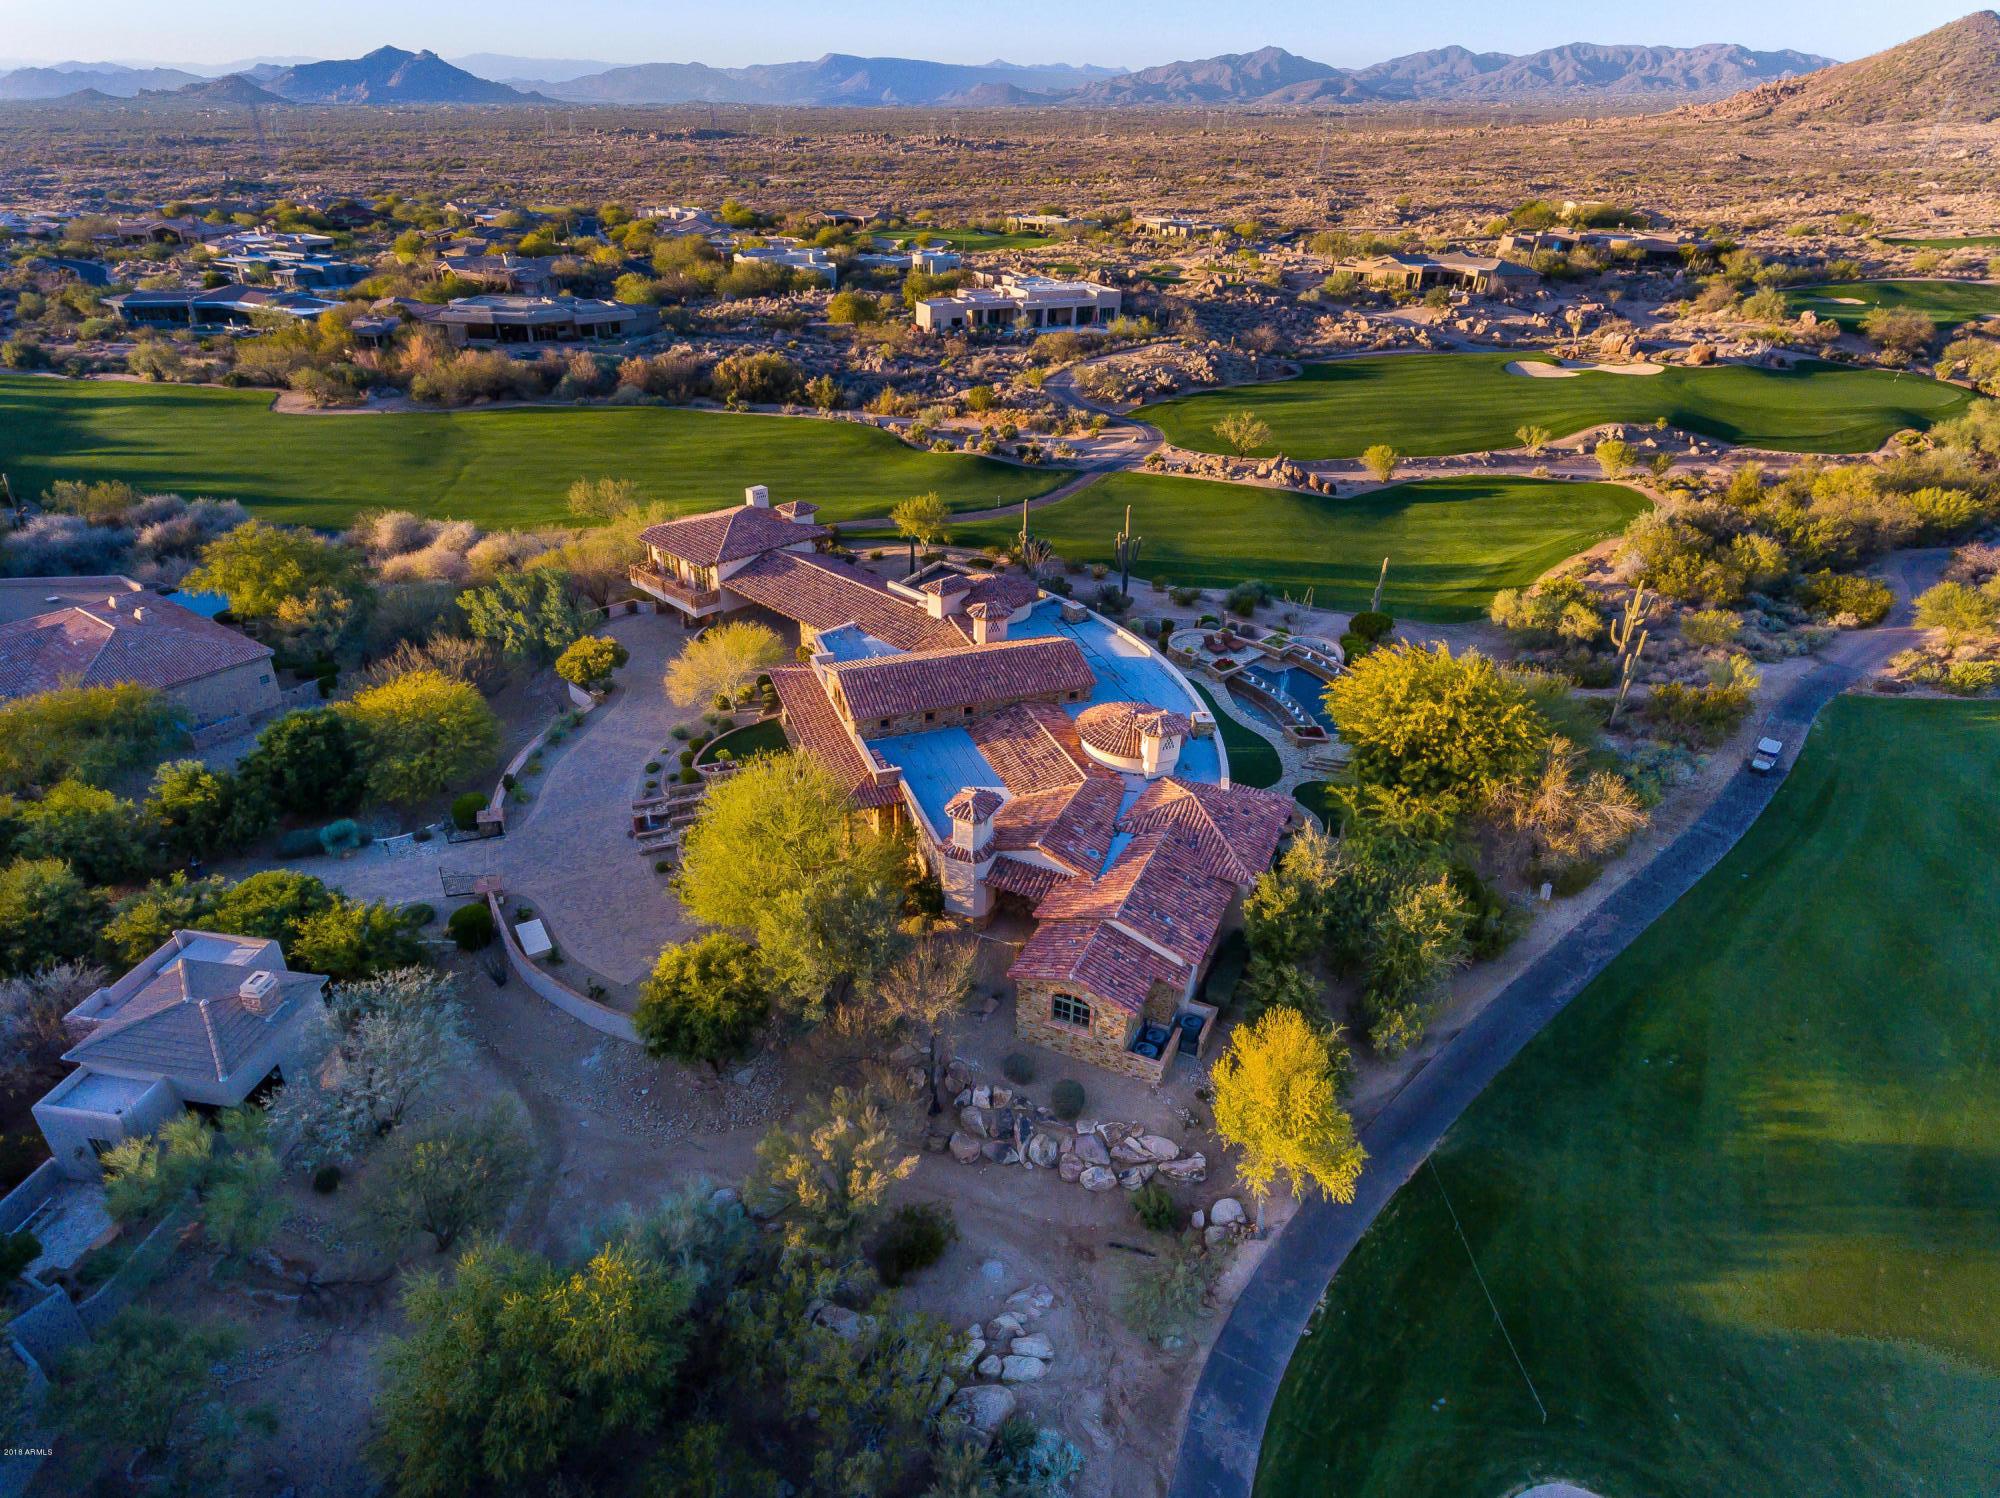 MLS 5725292 10232 E CINDER CONE Trail, Scottsdale, AZ 85262 Scottsdale AZ Troon North